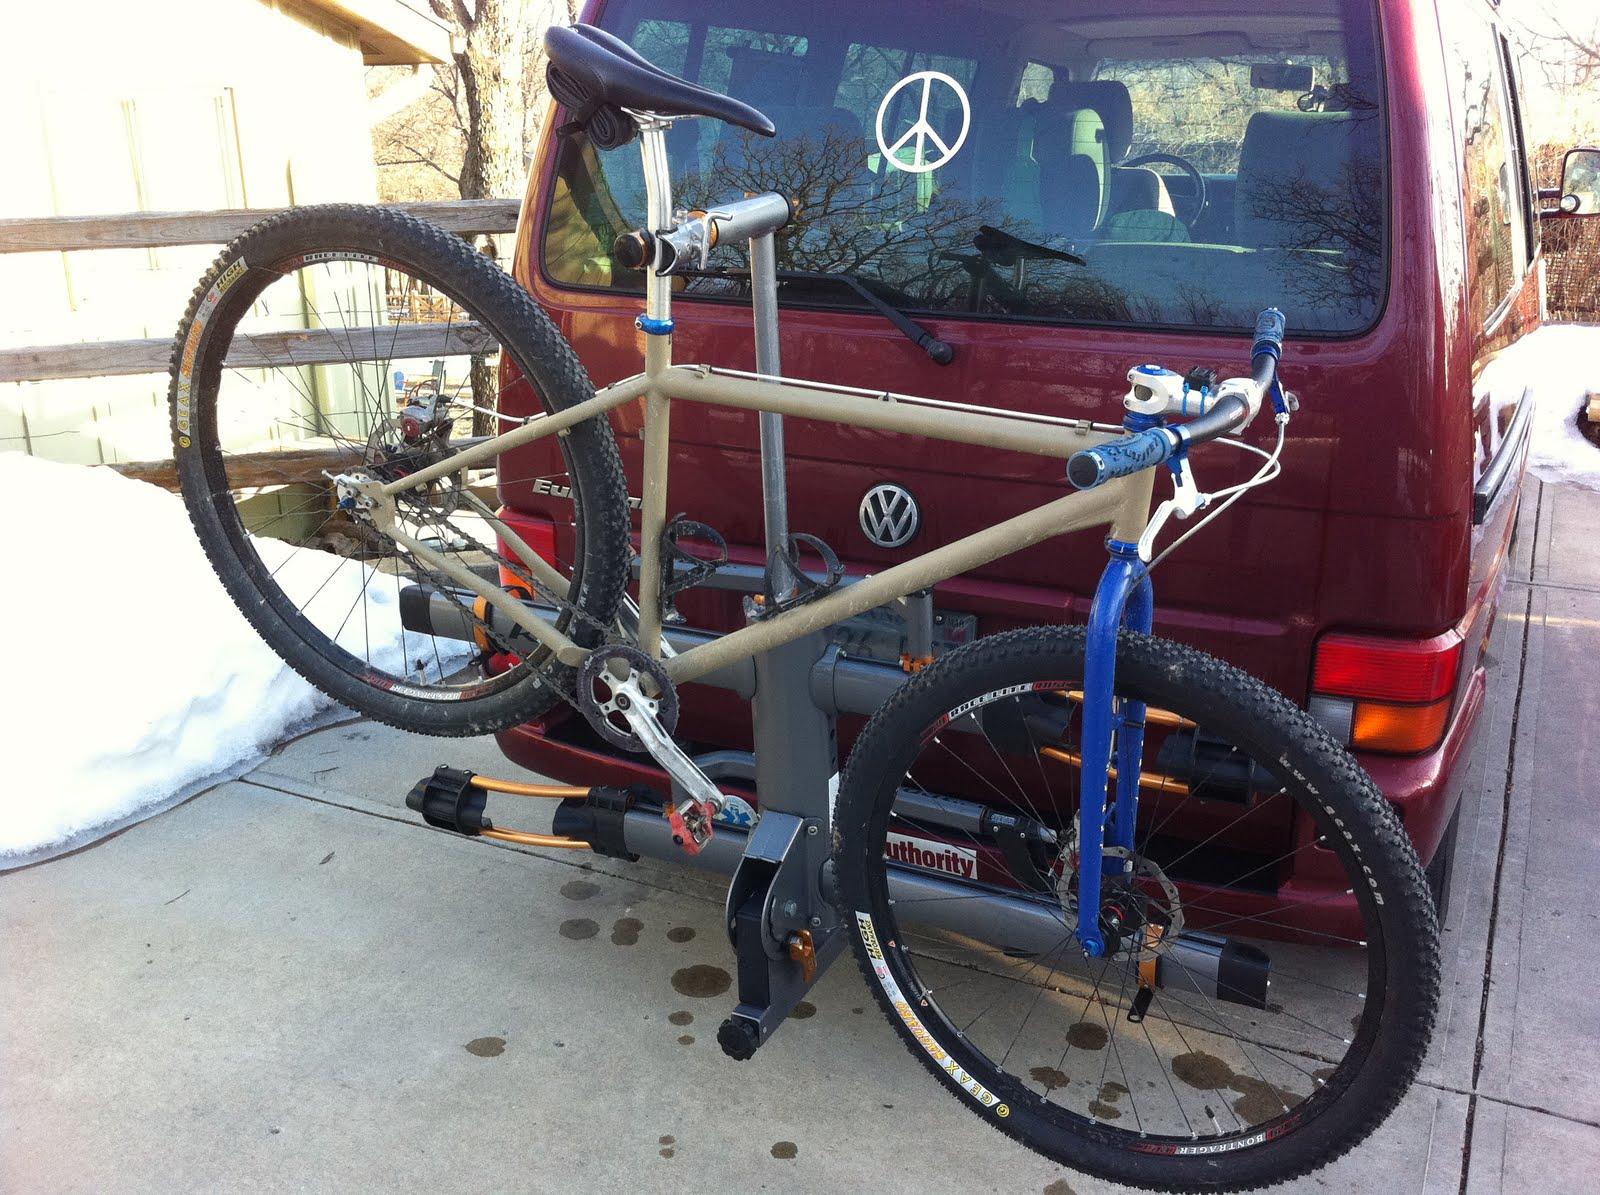 cosmecol rack usa com img kuat bike shootout lock beta hitch fat